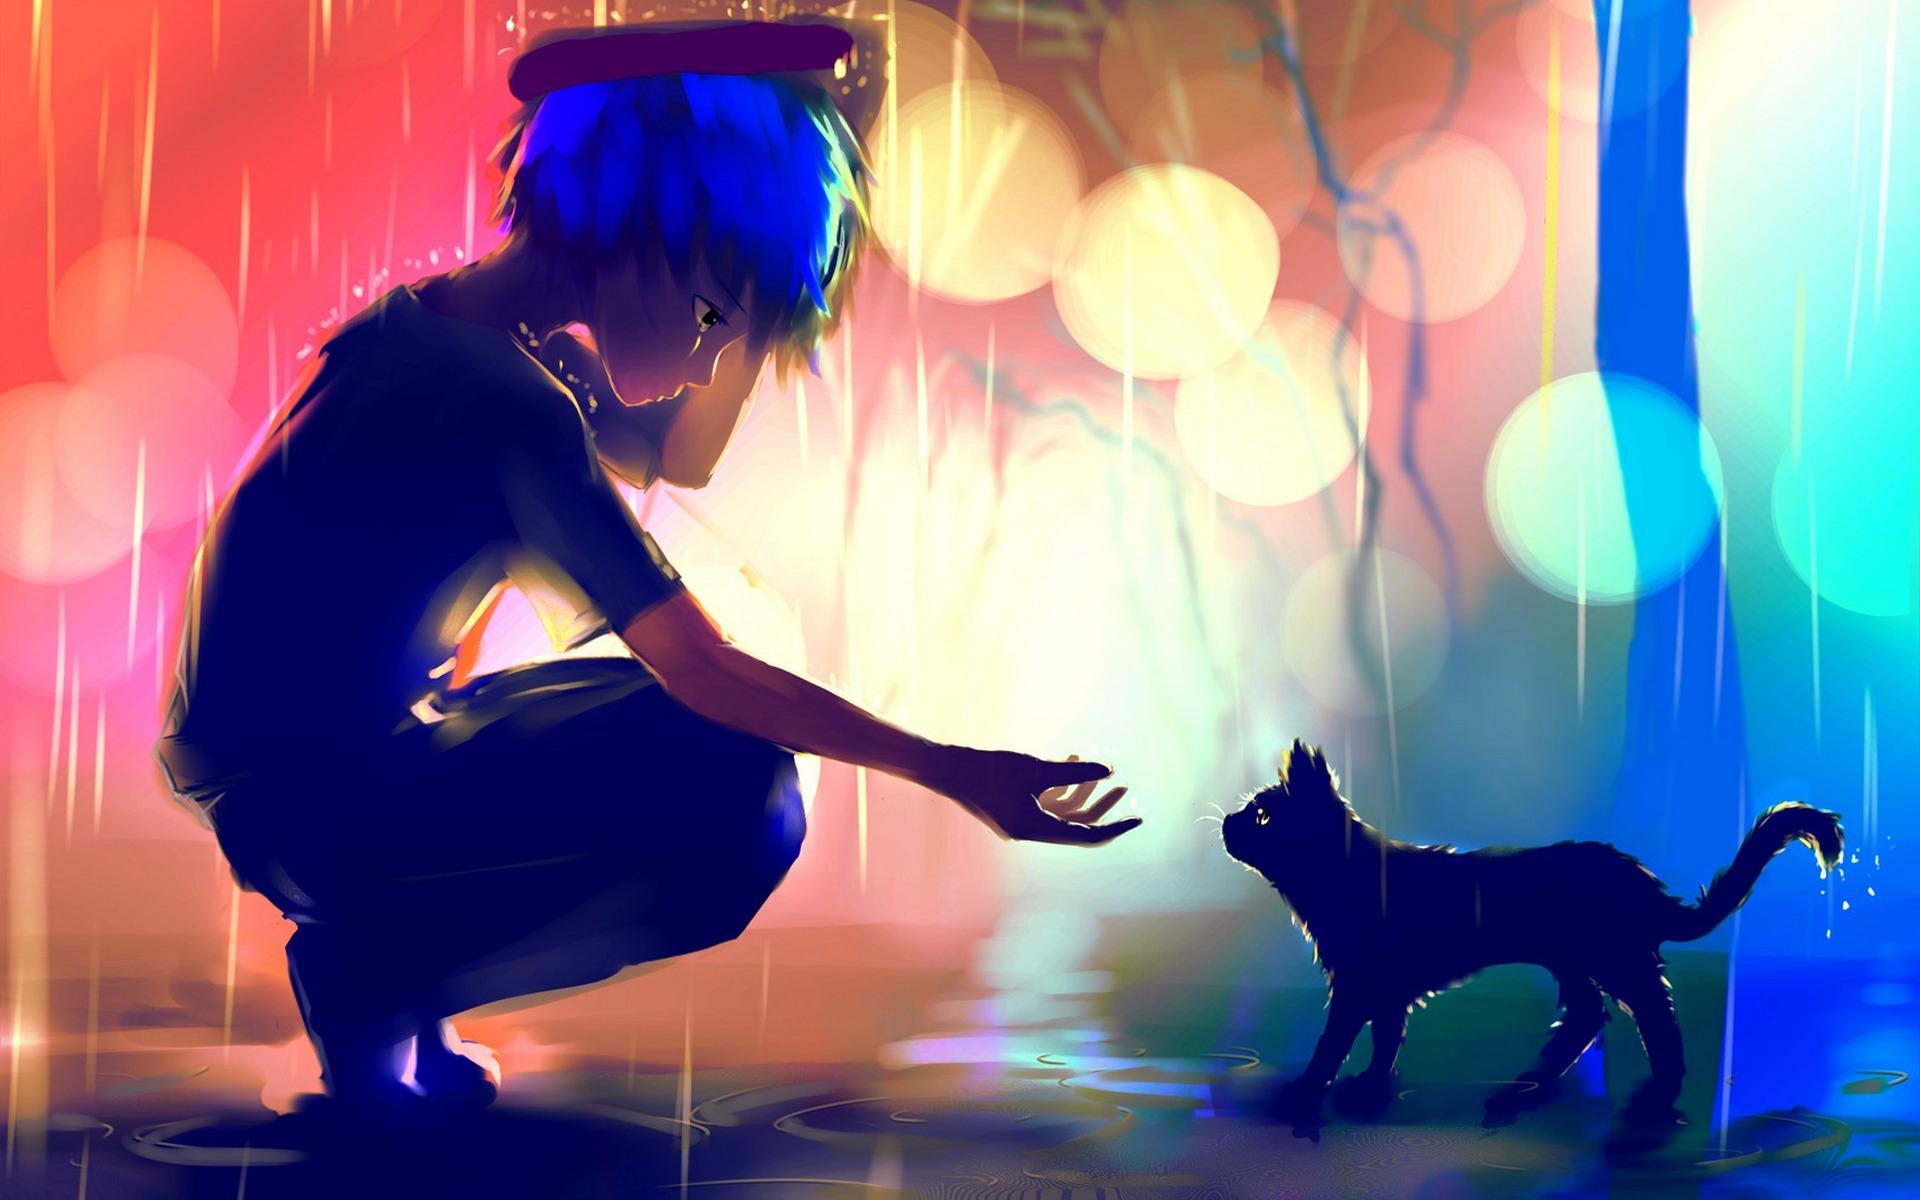 Boy cat or girl cat